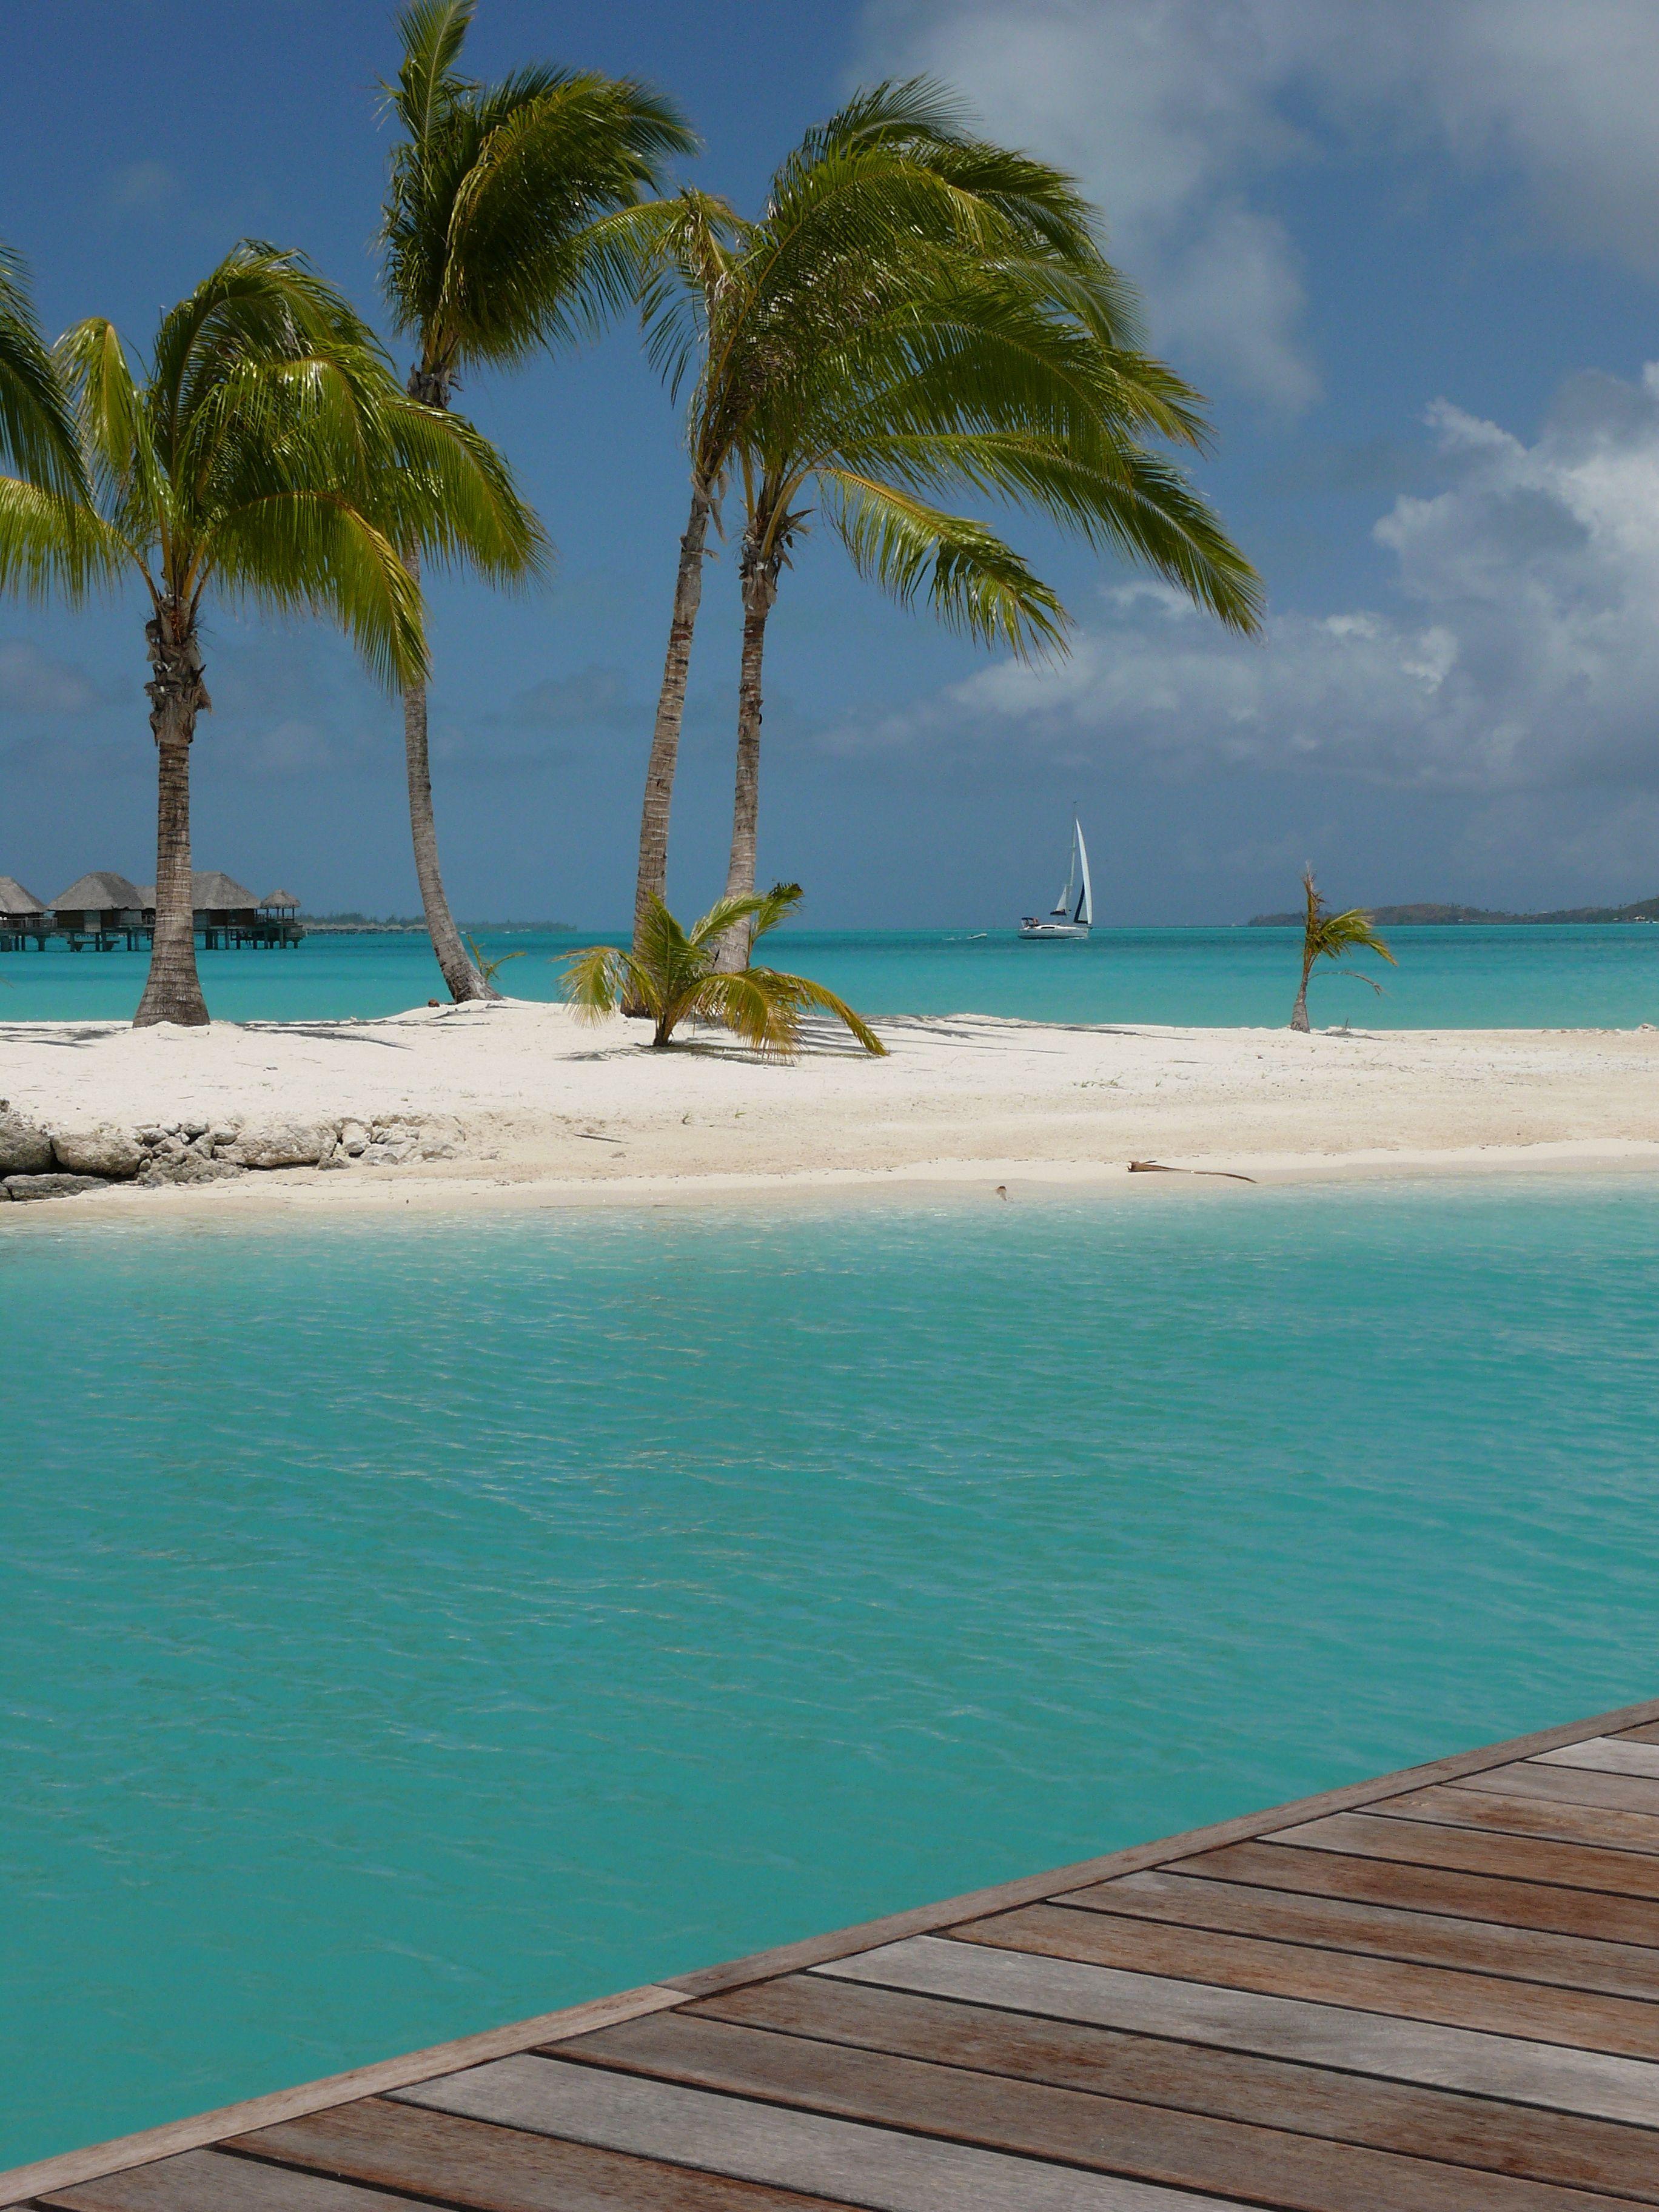 PalmTrees on an Island